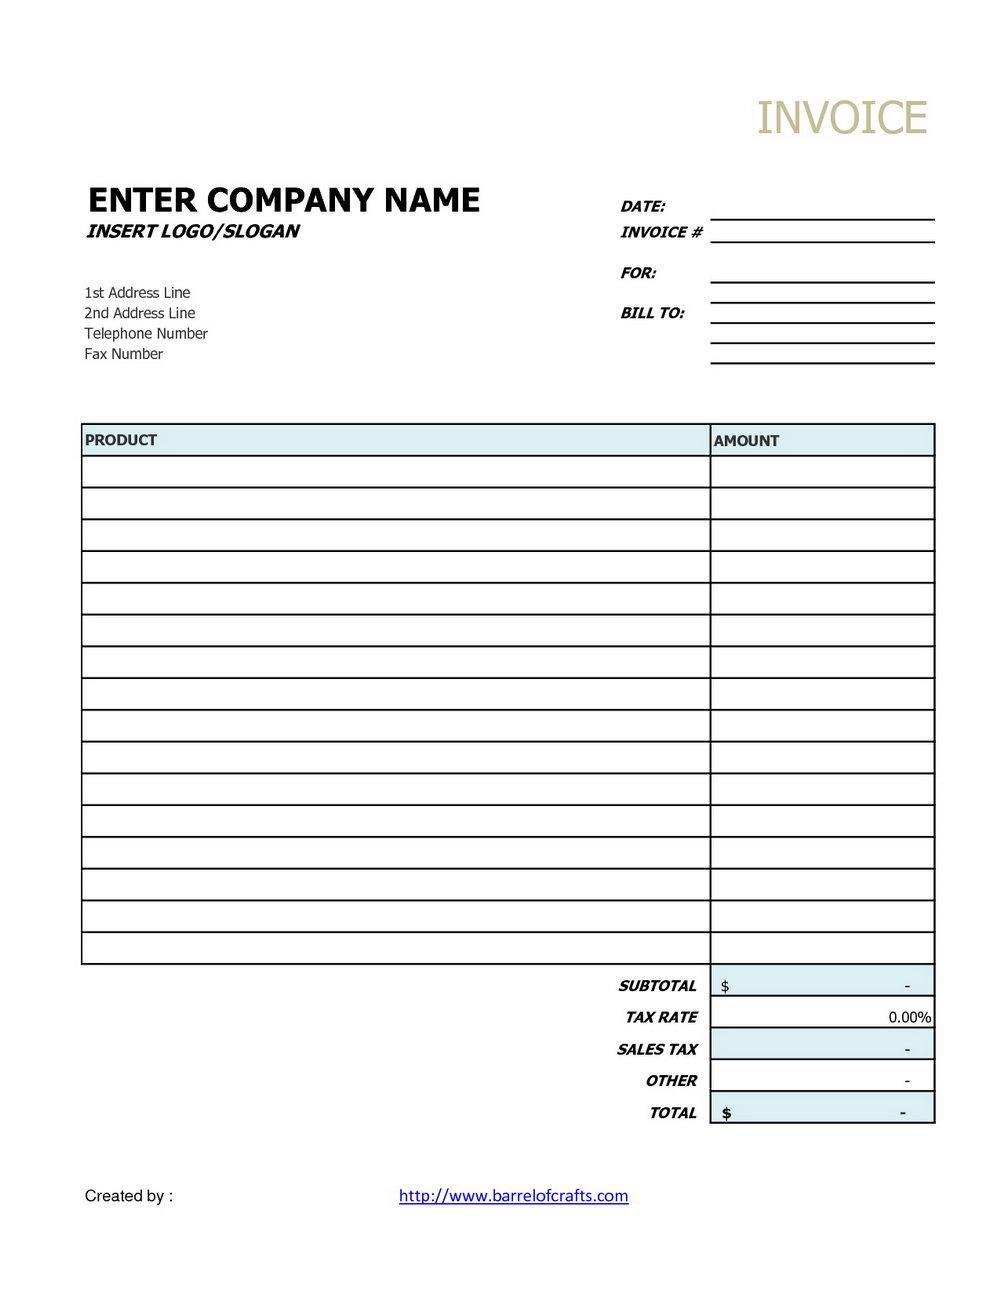 Generic Invoice Form